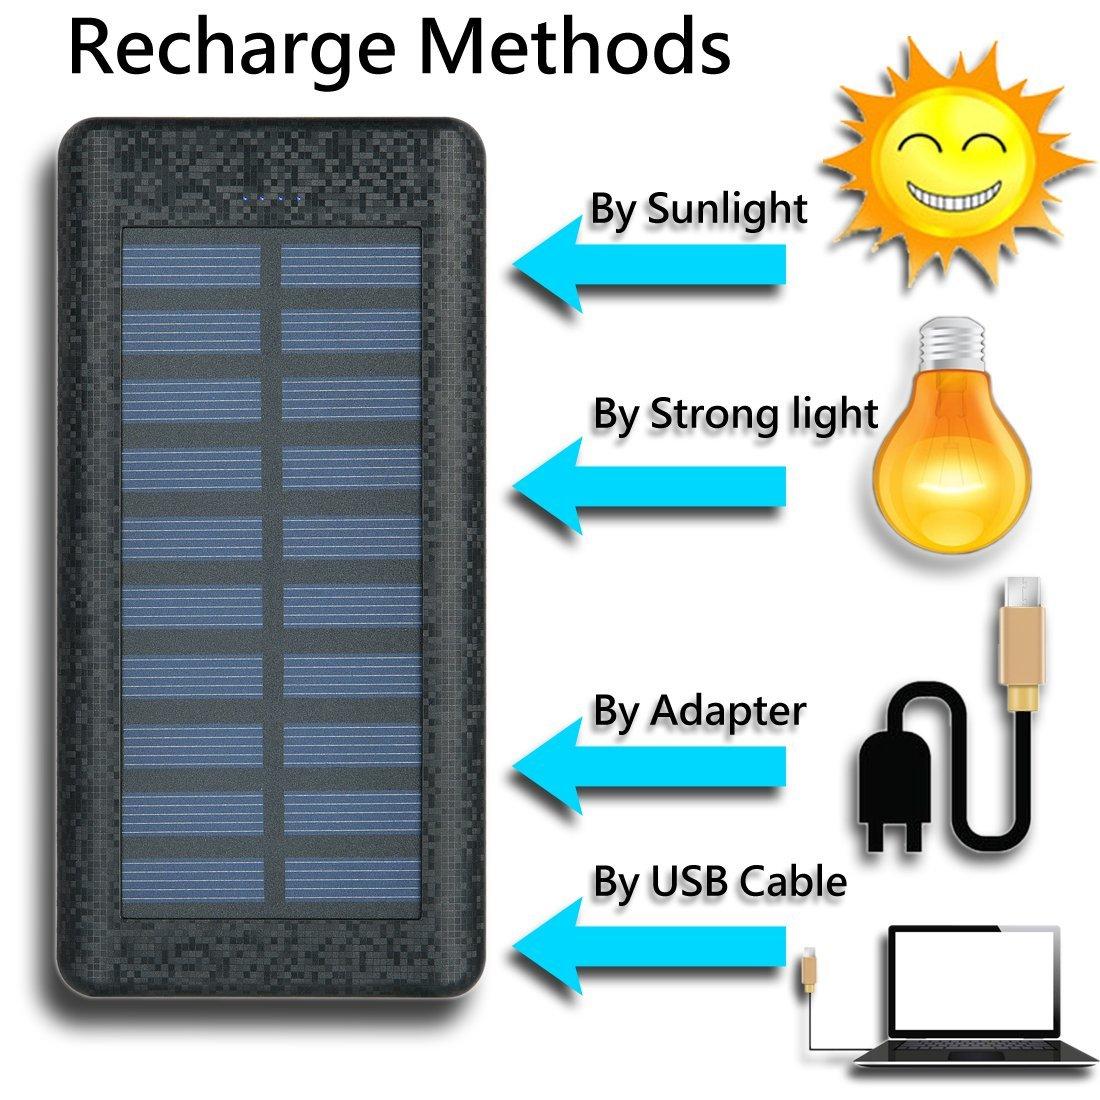 Solar Charger 24000mah Huaf Portable Battery Pack Phone 3 Casan 3usb Samsung Usb Ports1a 2a